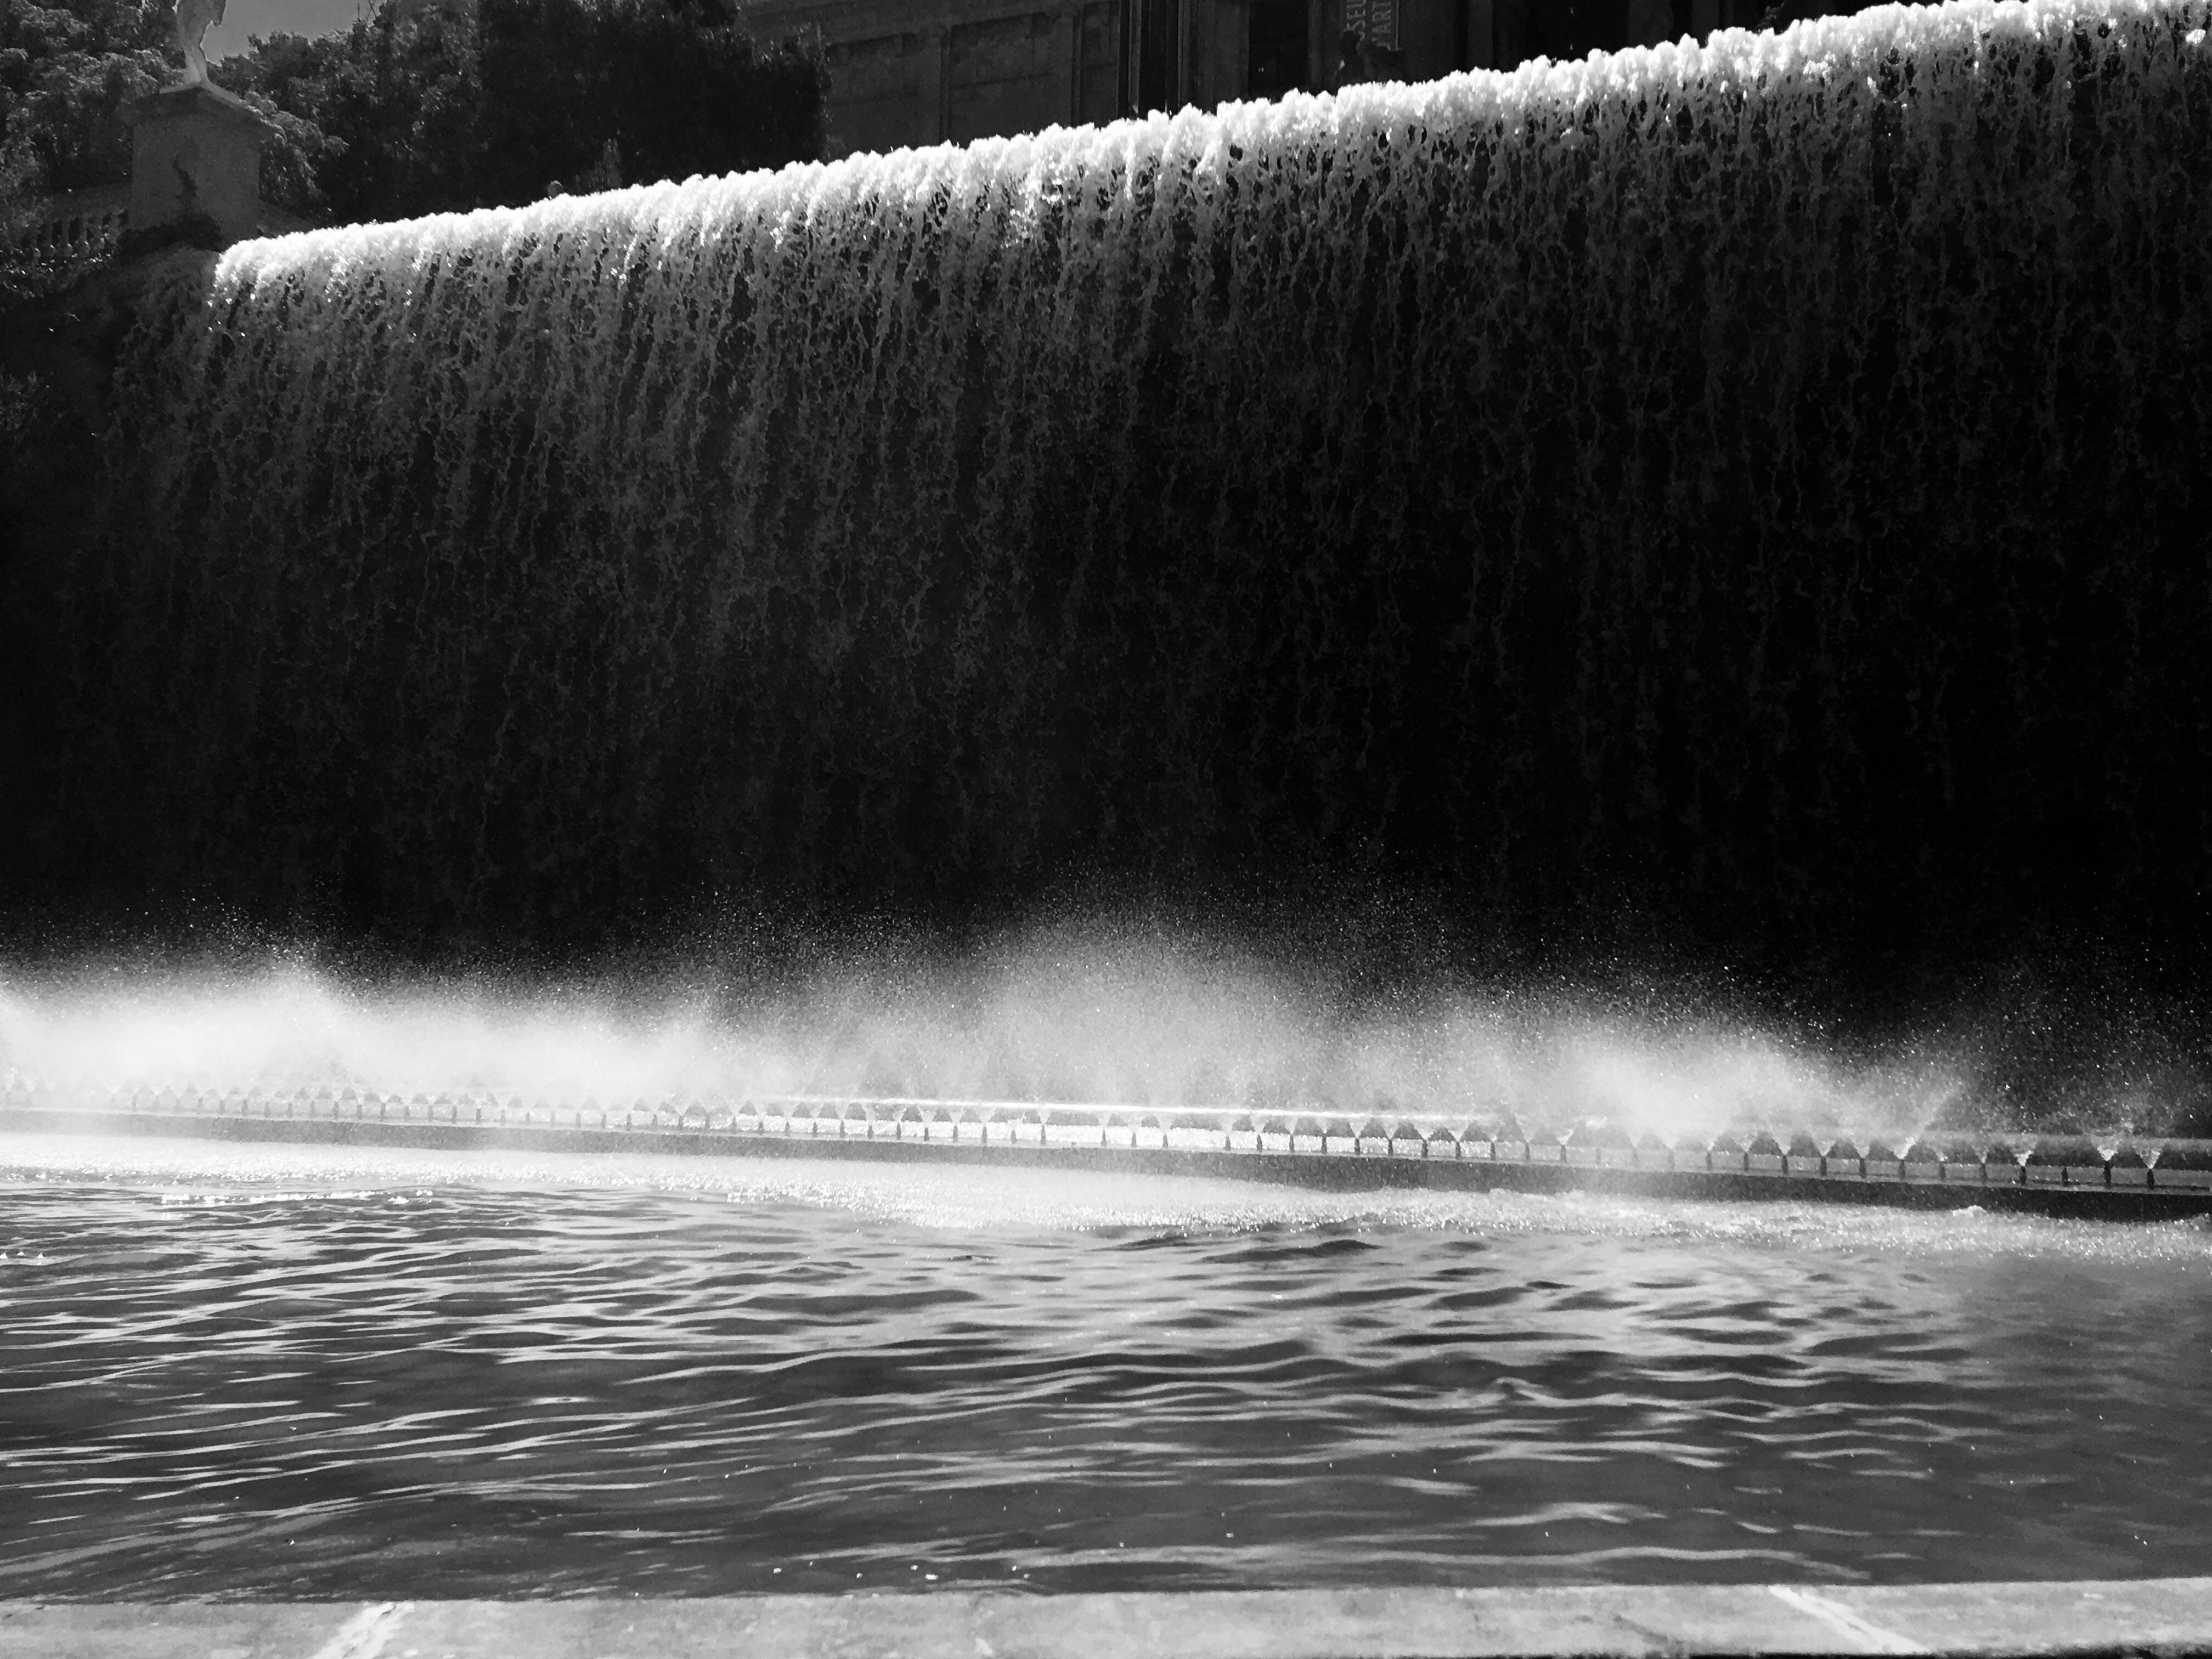 Free stock photo of #mobilechallenge, #outdoorchallenge, black and white, monochrome